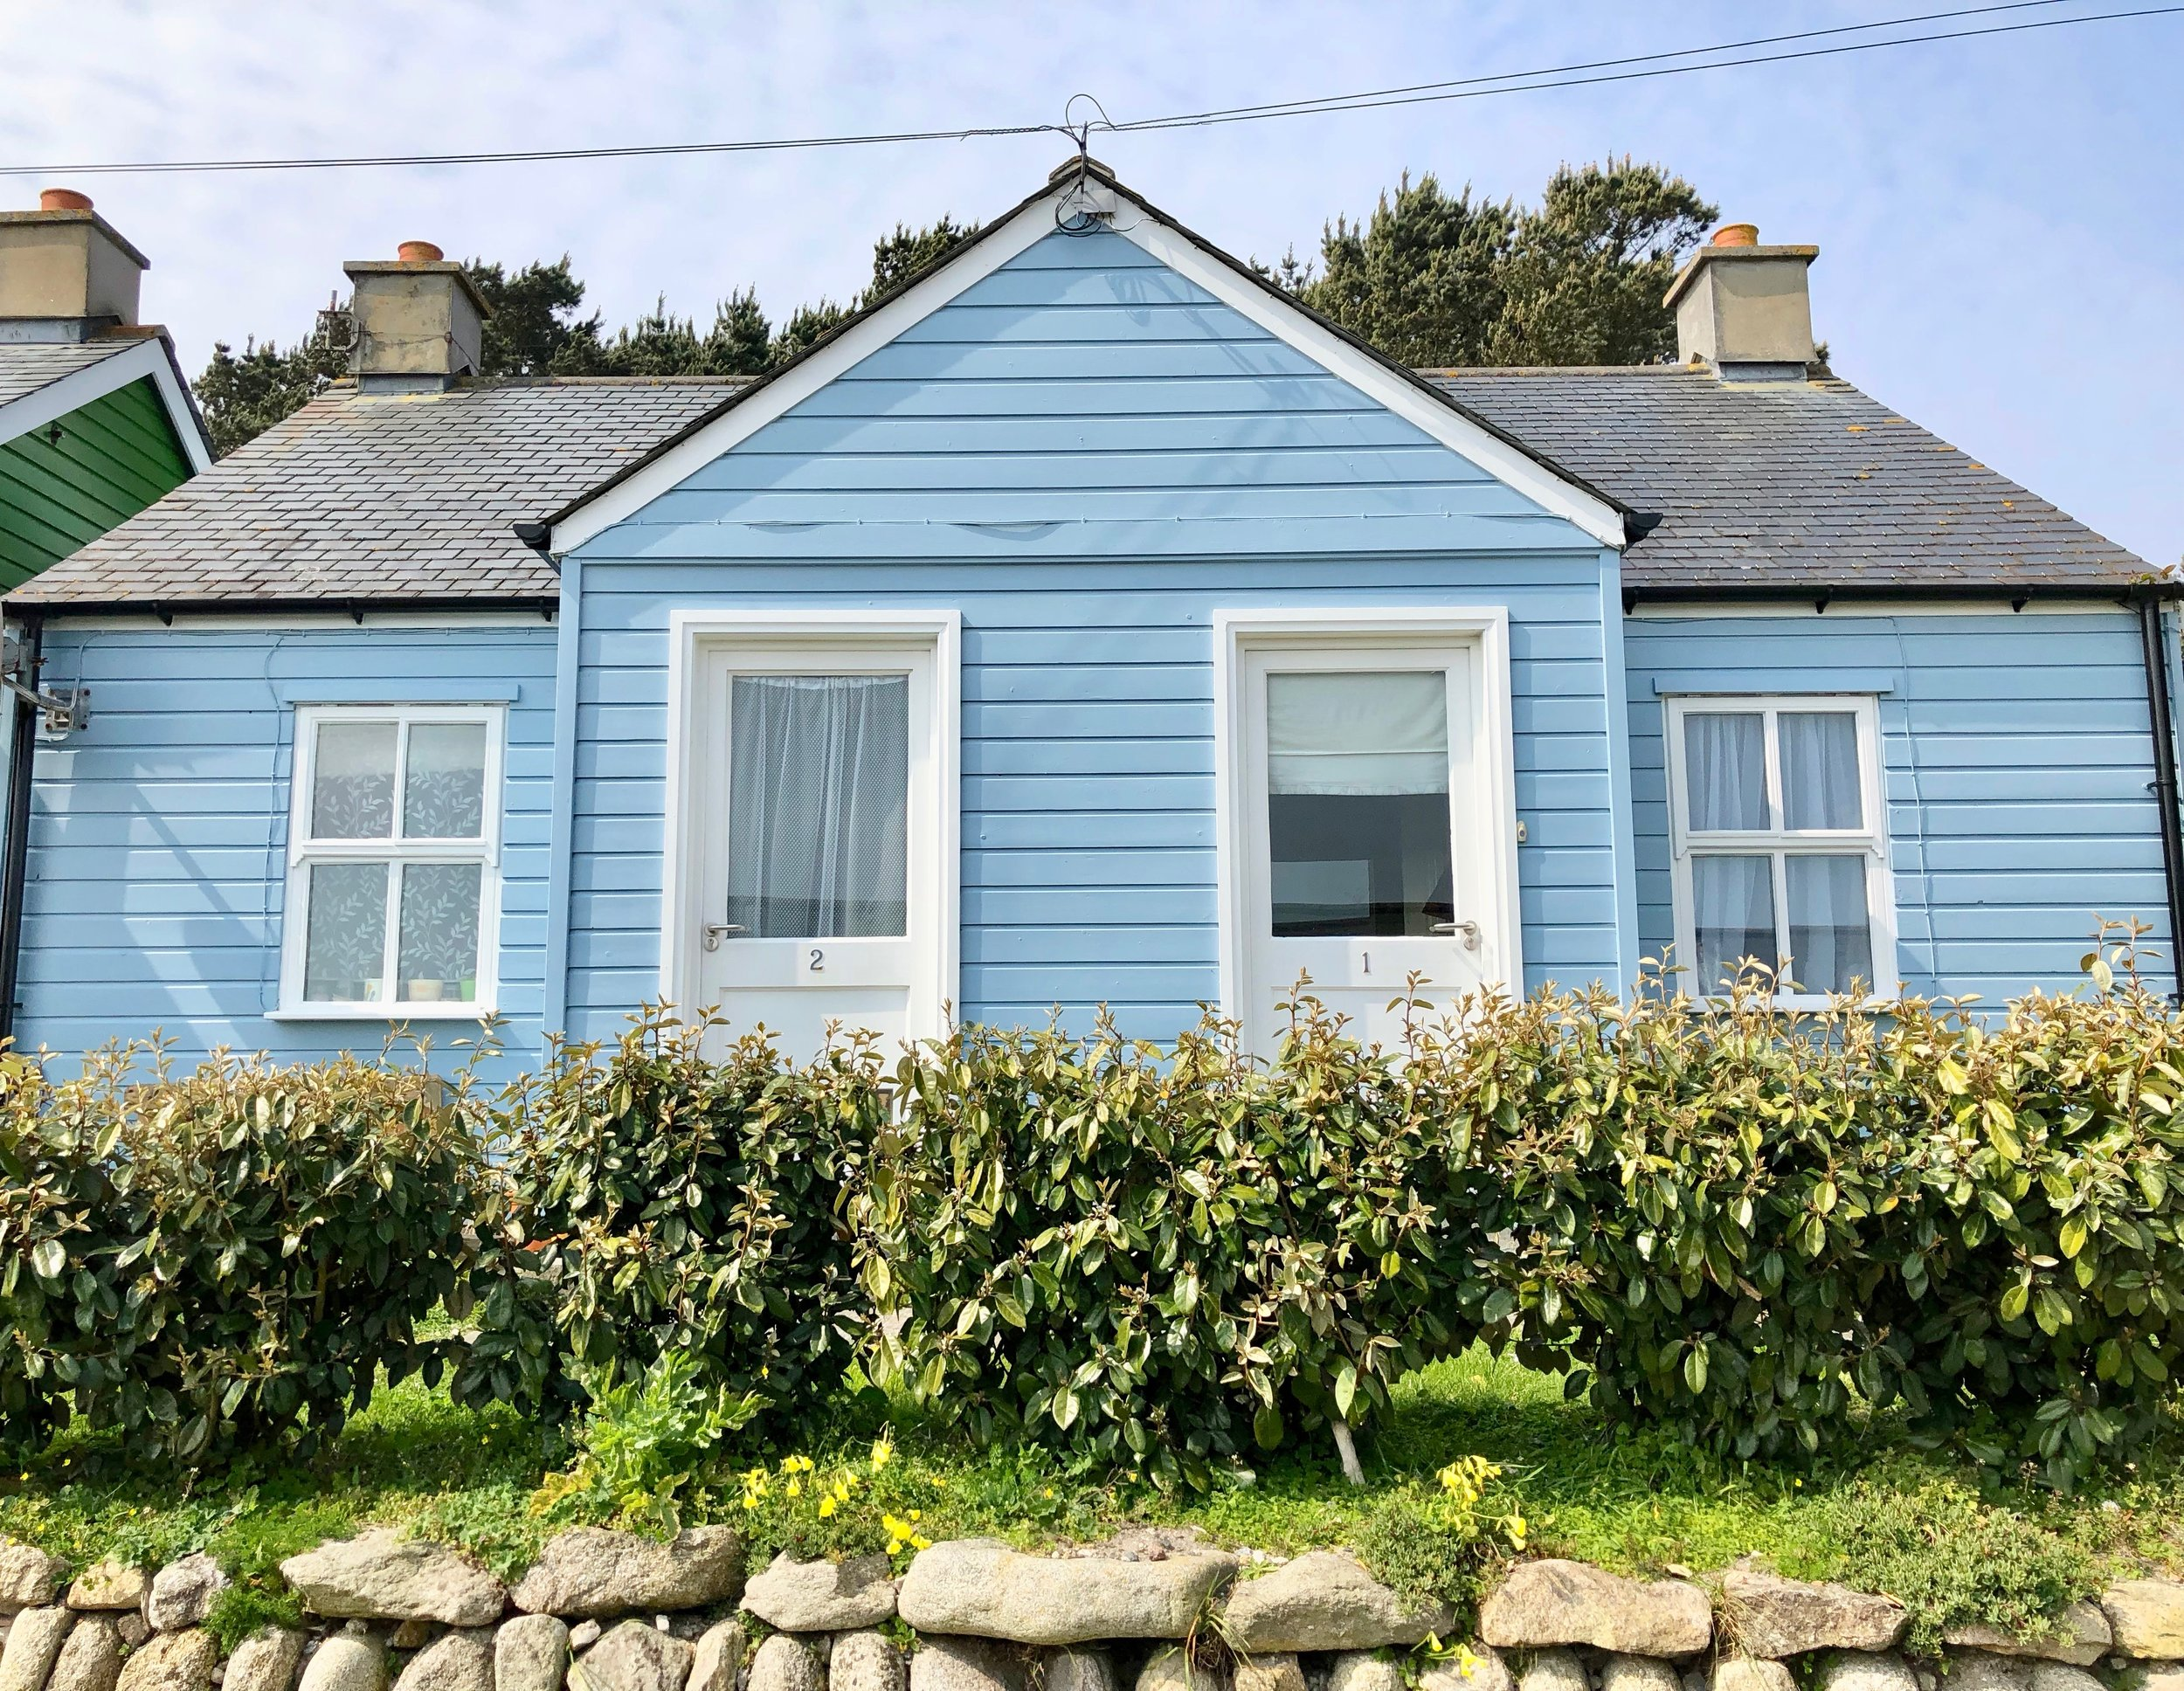 Cottage on Tresco Island, Scilly Isles (1).jpg